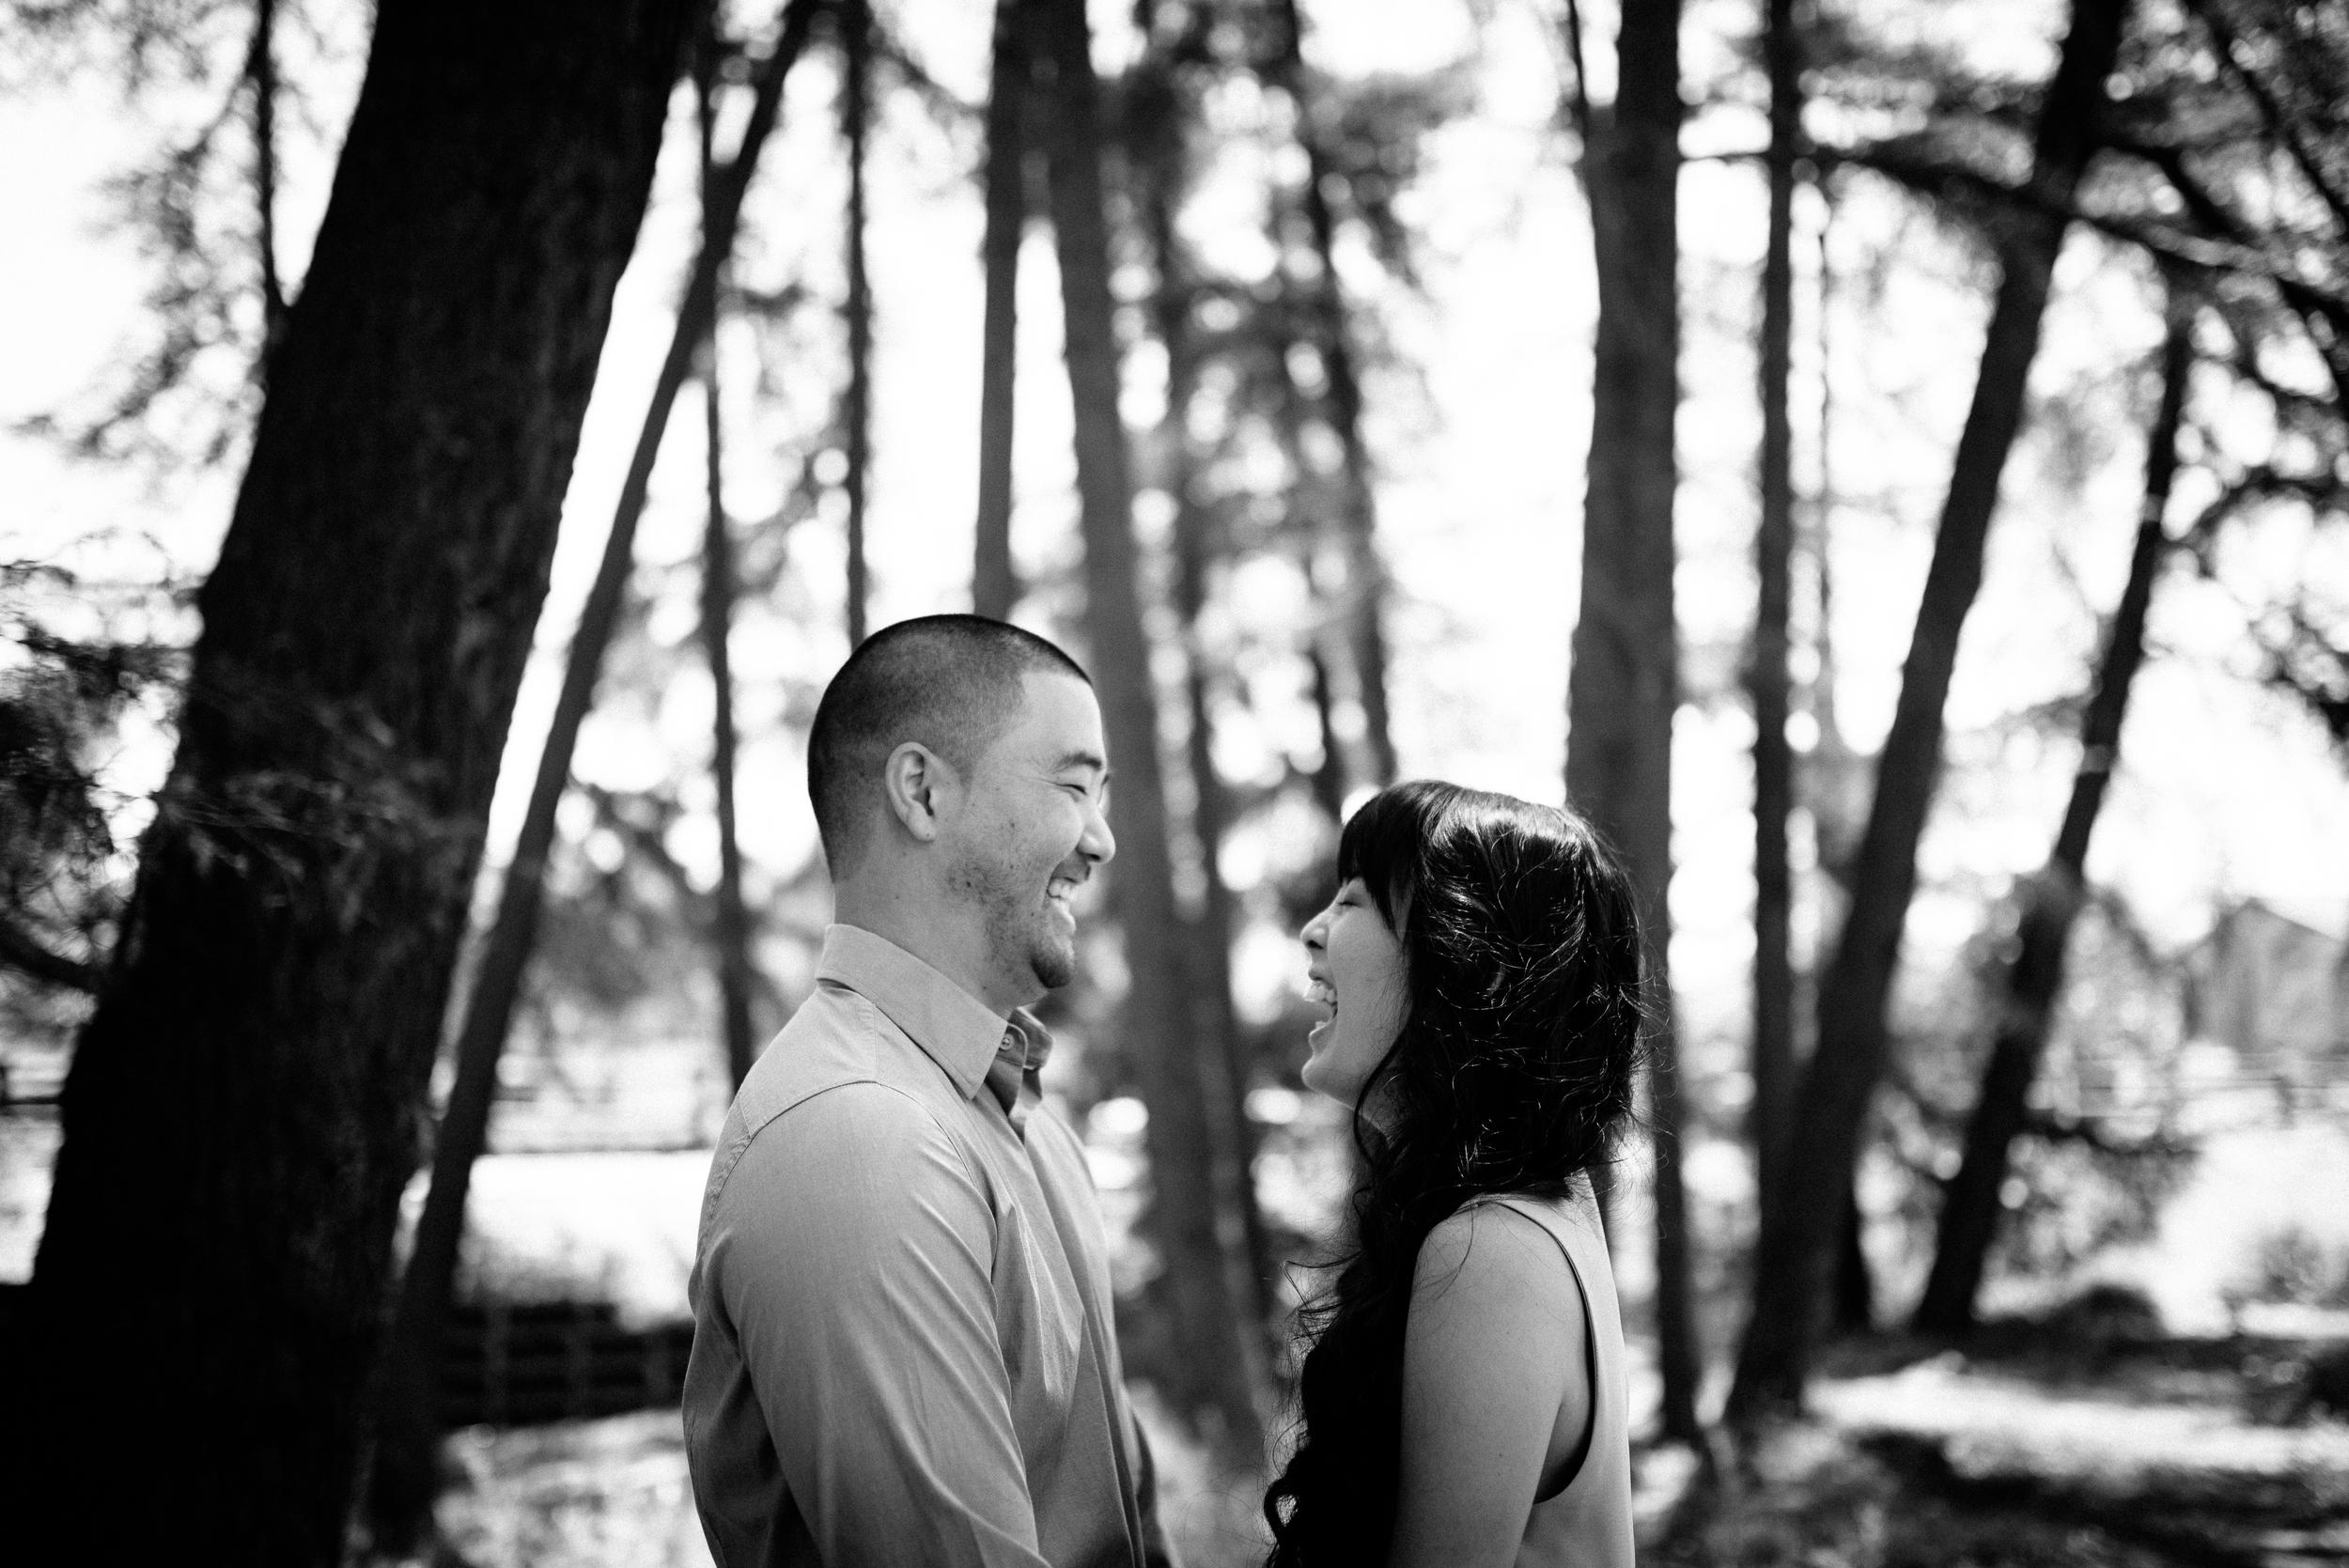 15_CourtneyandMatt_Engagement_391-2.jpg